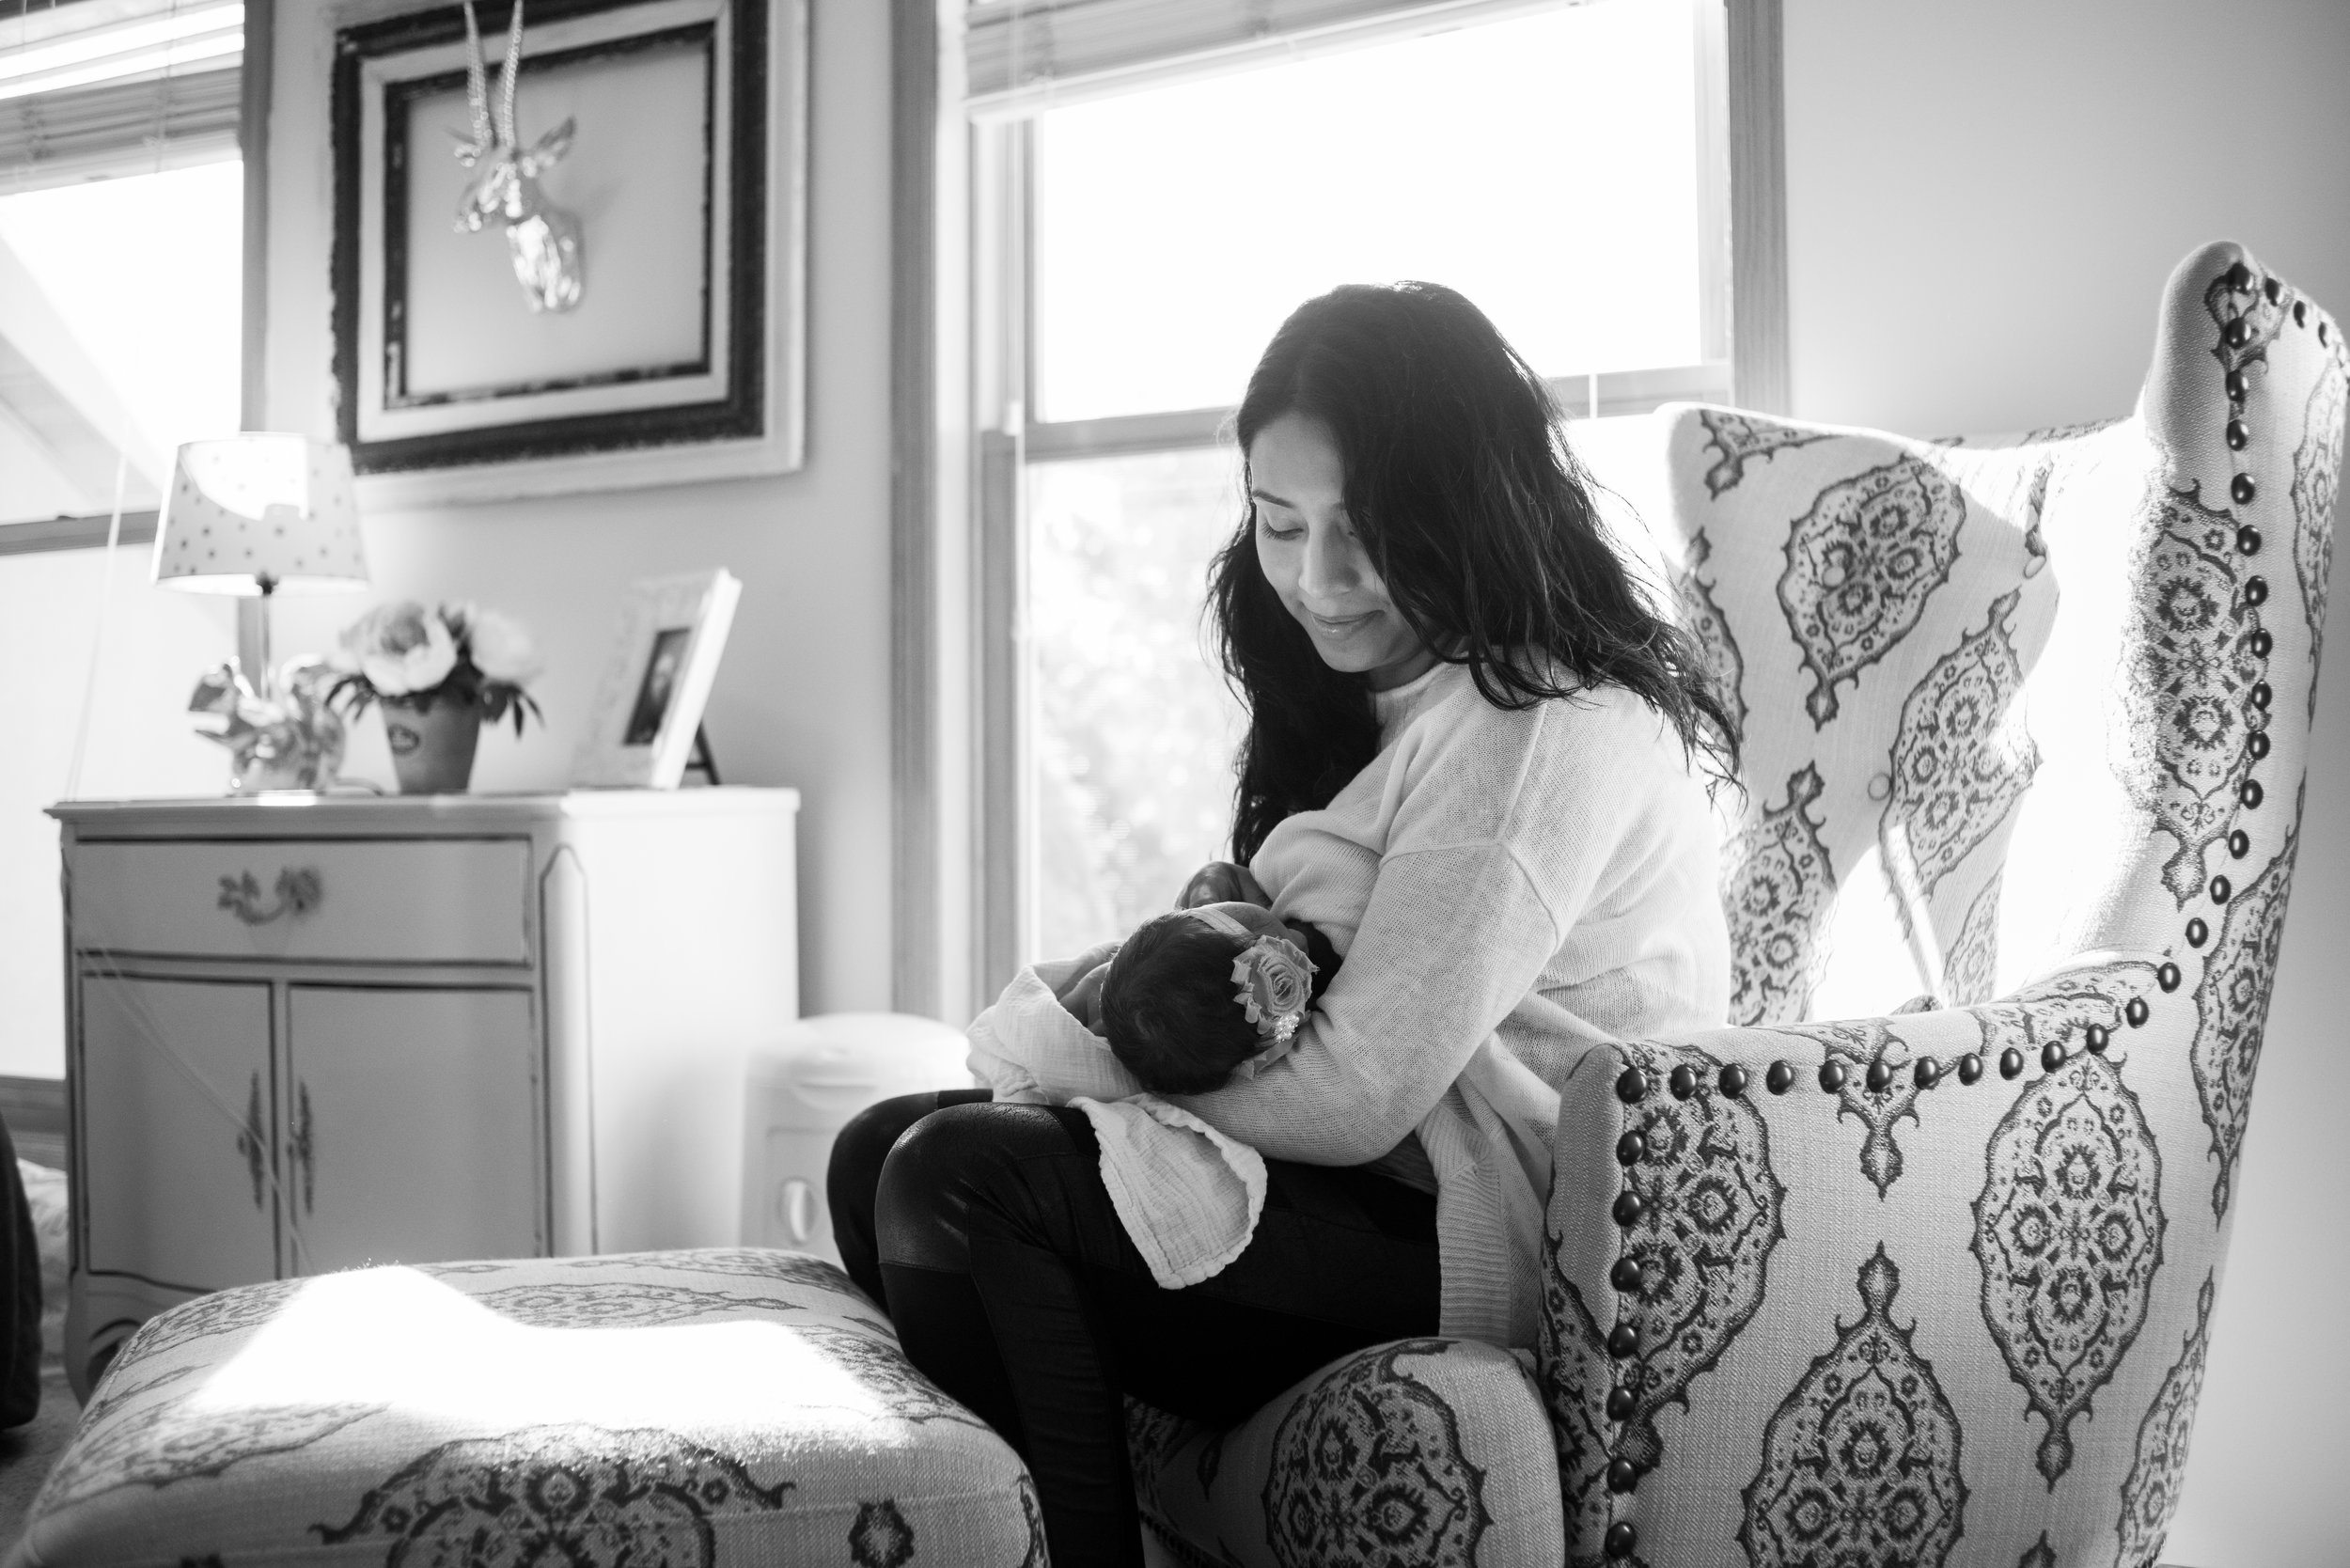 JuliaMatthewsPhotography_MadisonWisconsinFamilyPhotography_Newborn-17.jpg